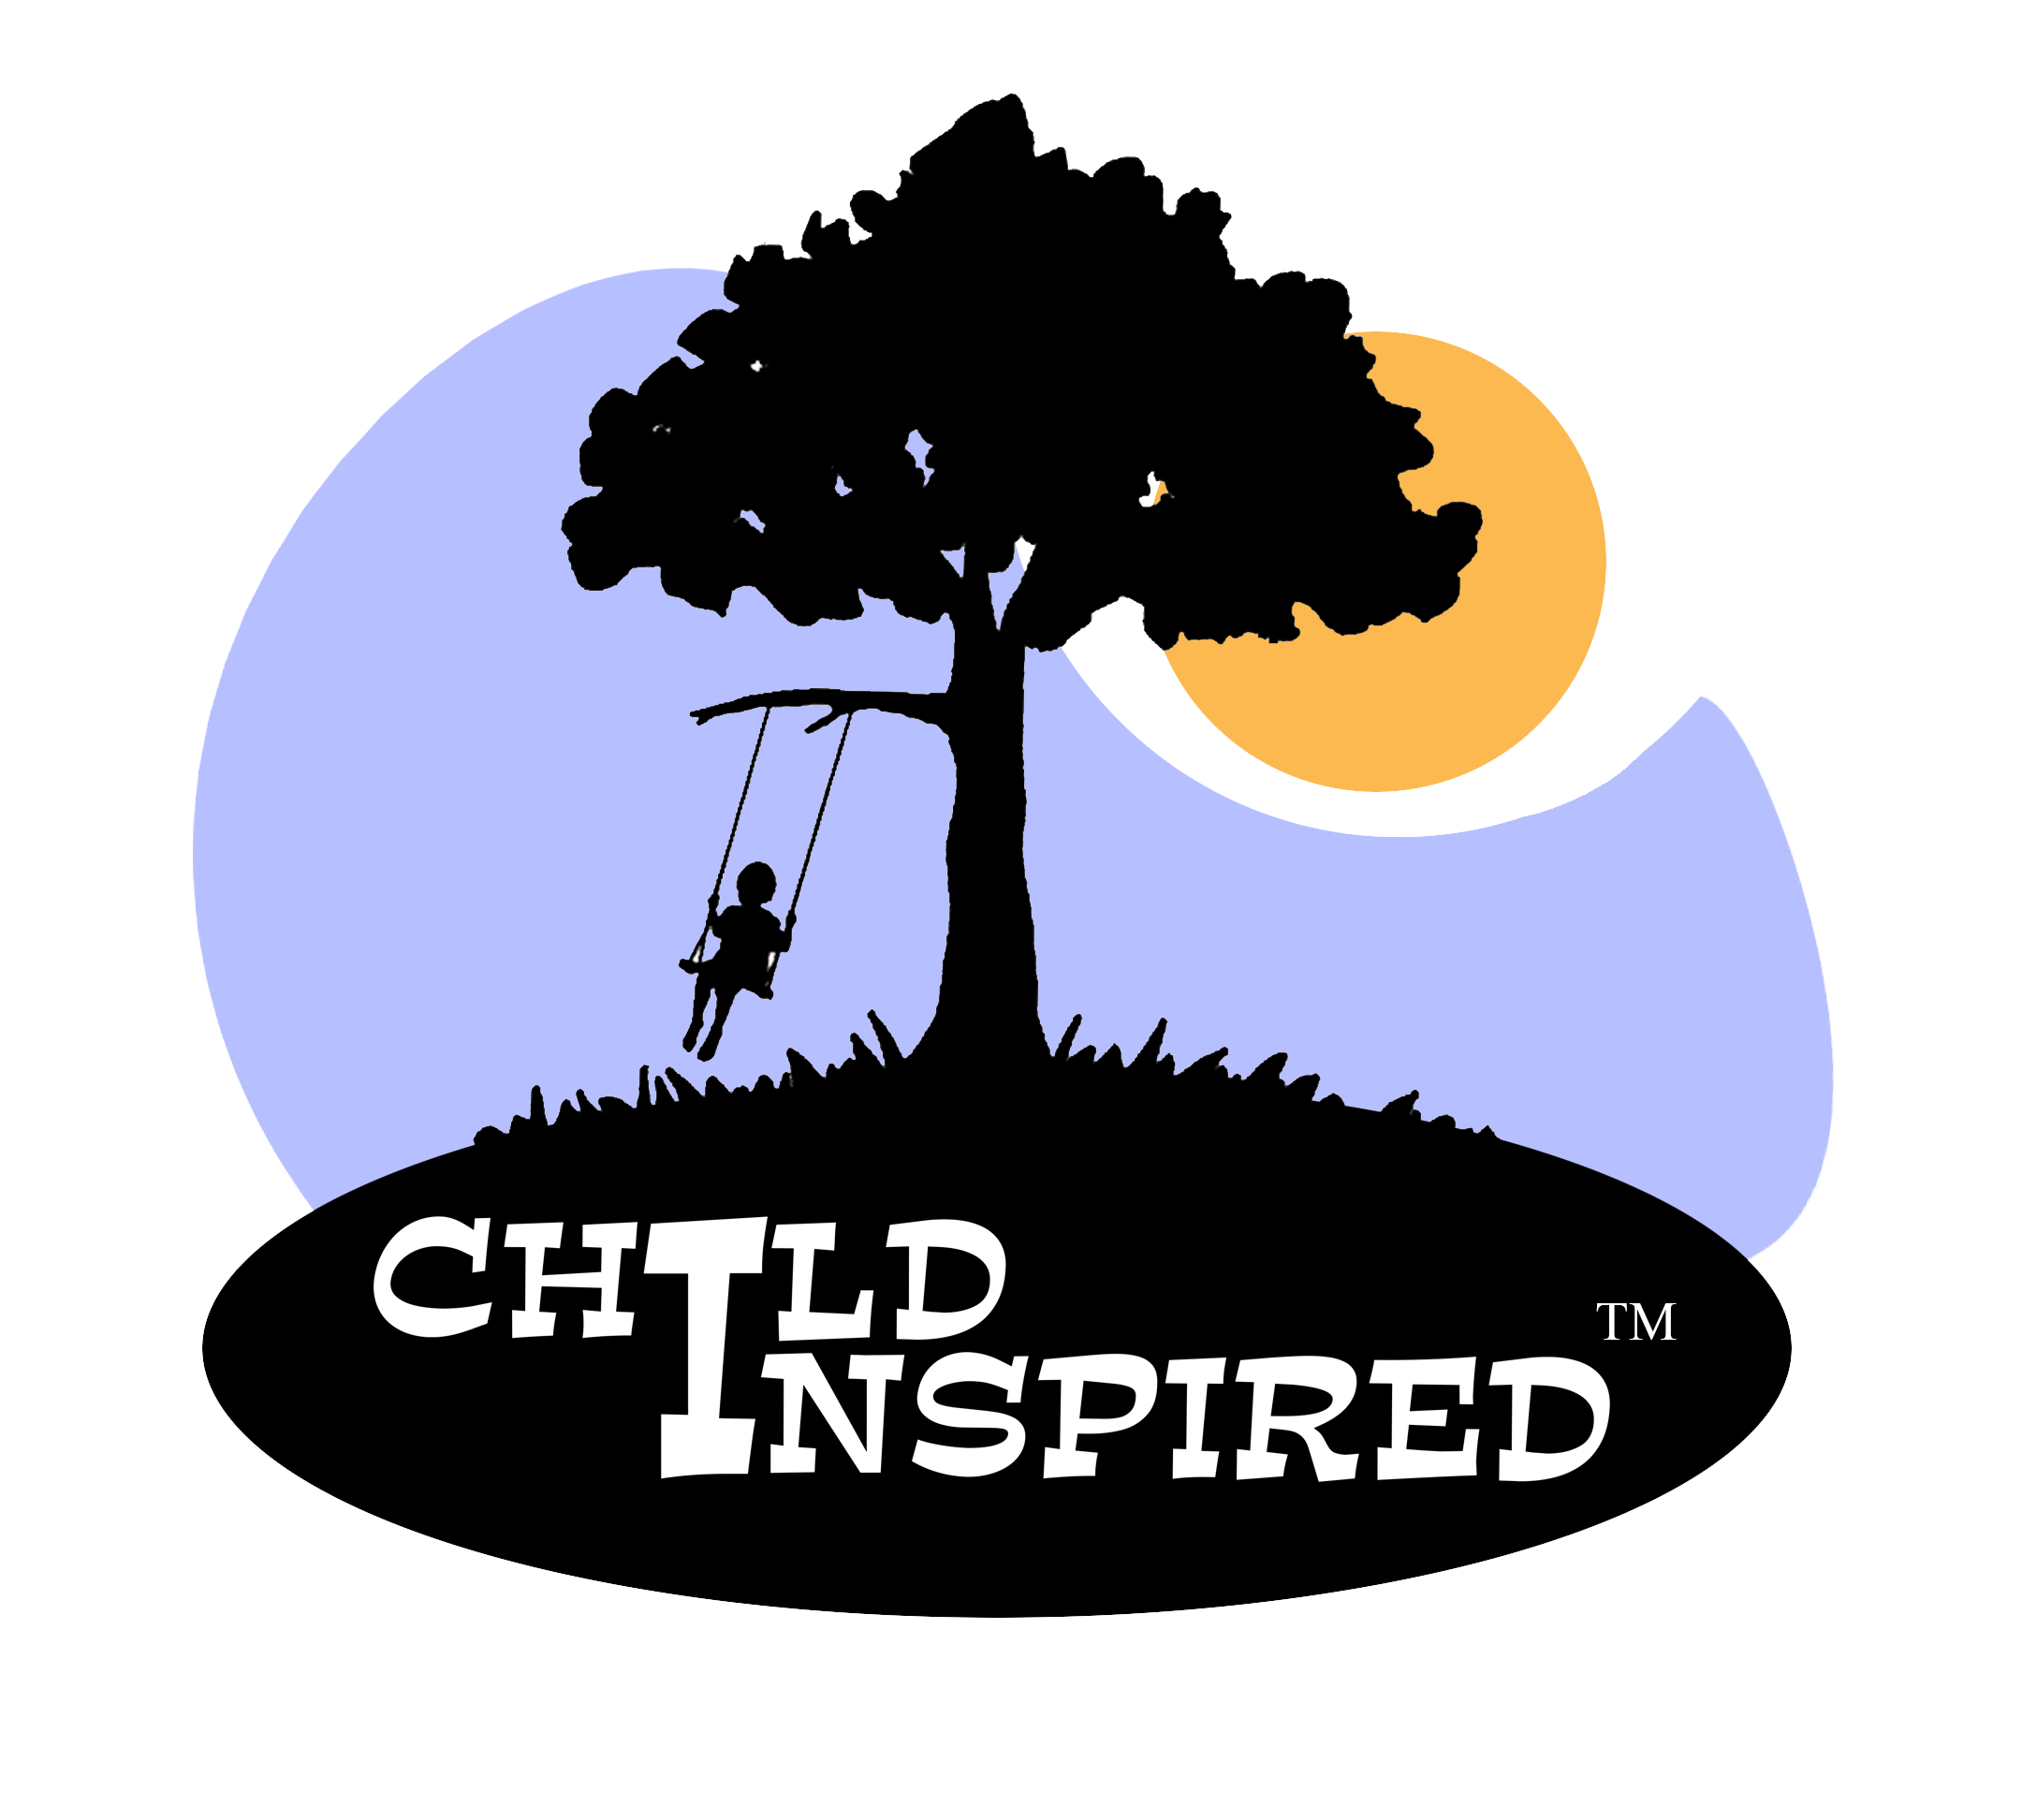 Child Inspired